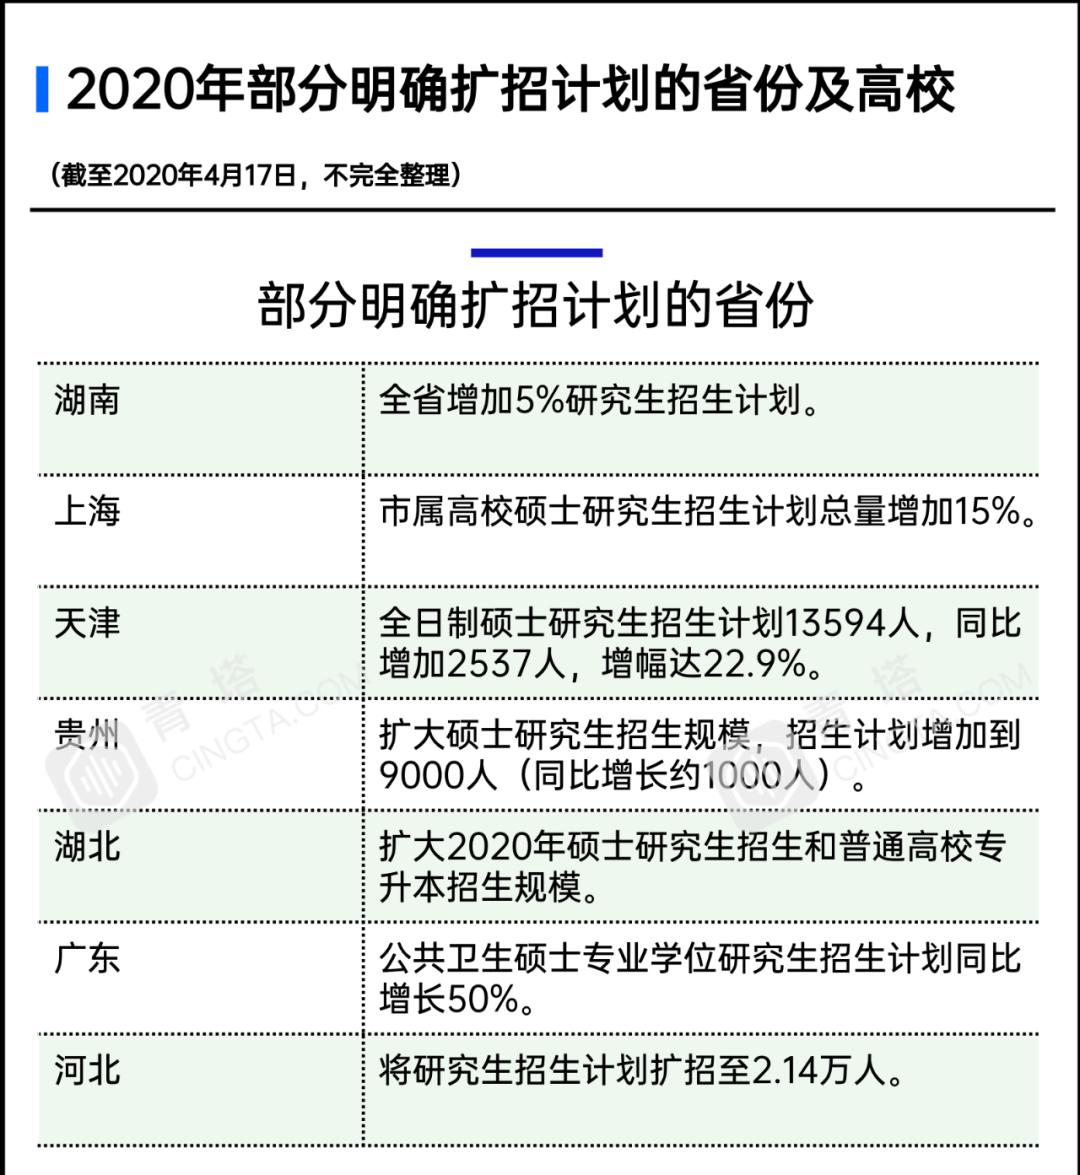 �T士研究生�U招18.9�f!部分<a href=http://www.dearbook.net.cn/school/ target=_blank class=infotextkey>高校</a>研究生�U招比例超50%